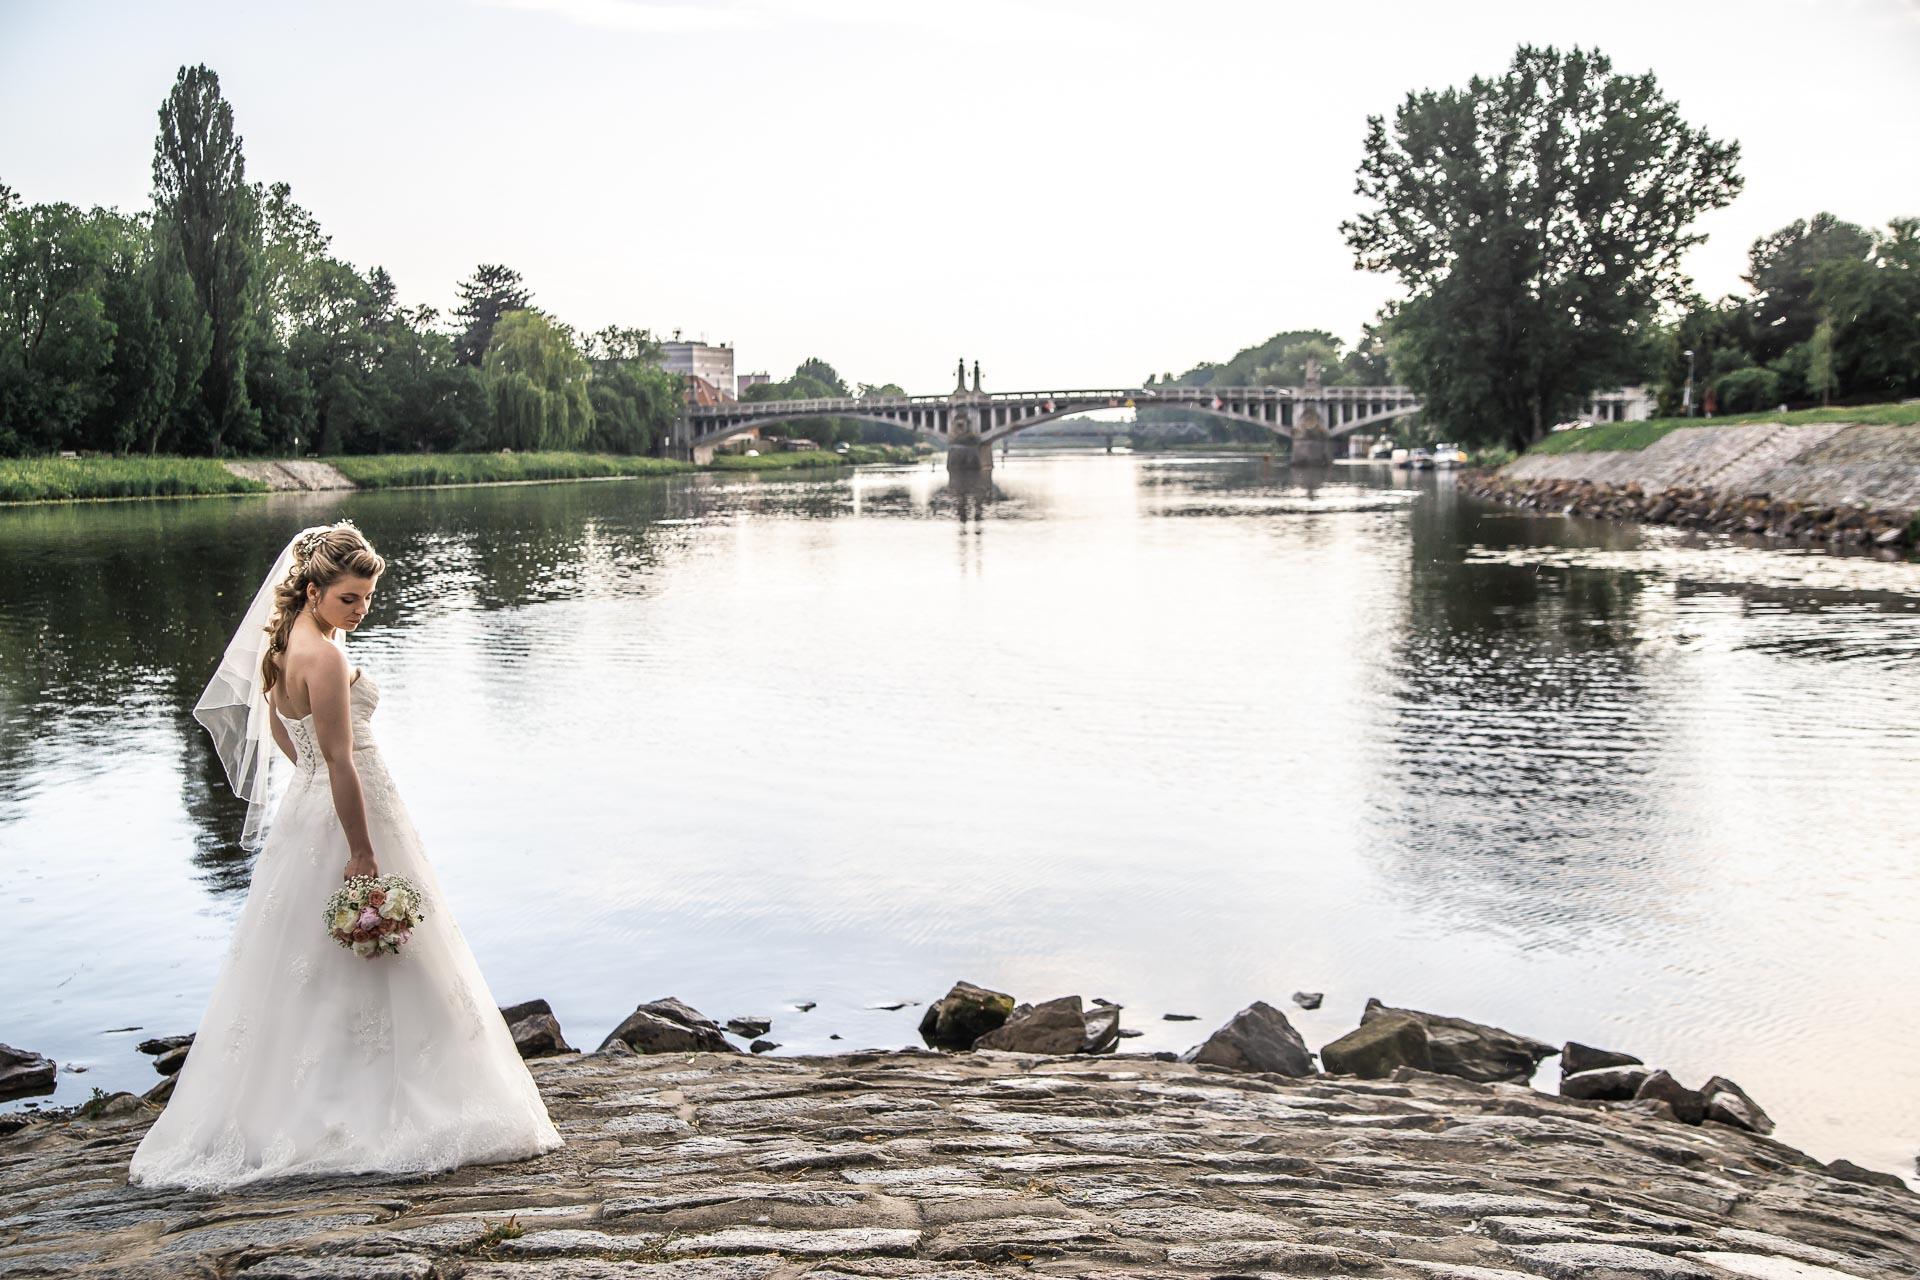 Svatební-fotograf-Nymburk-6255